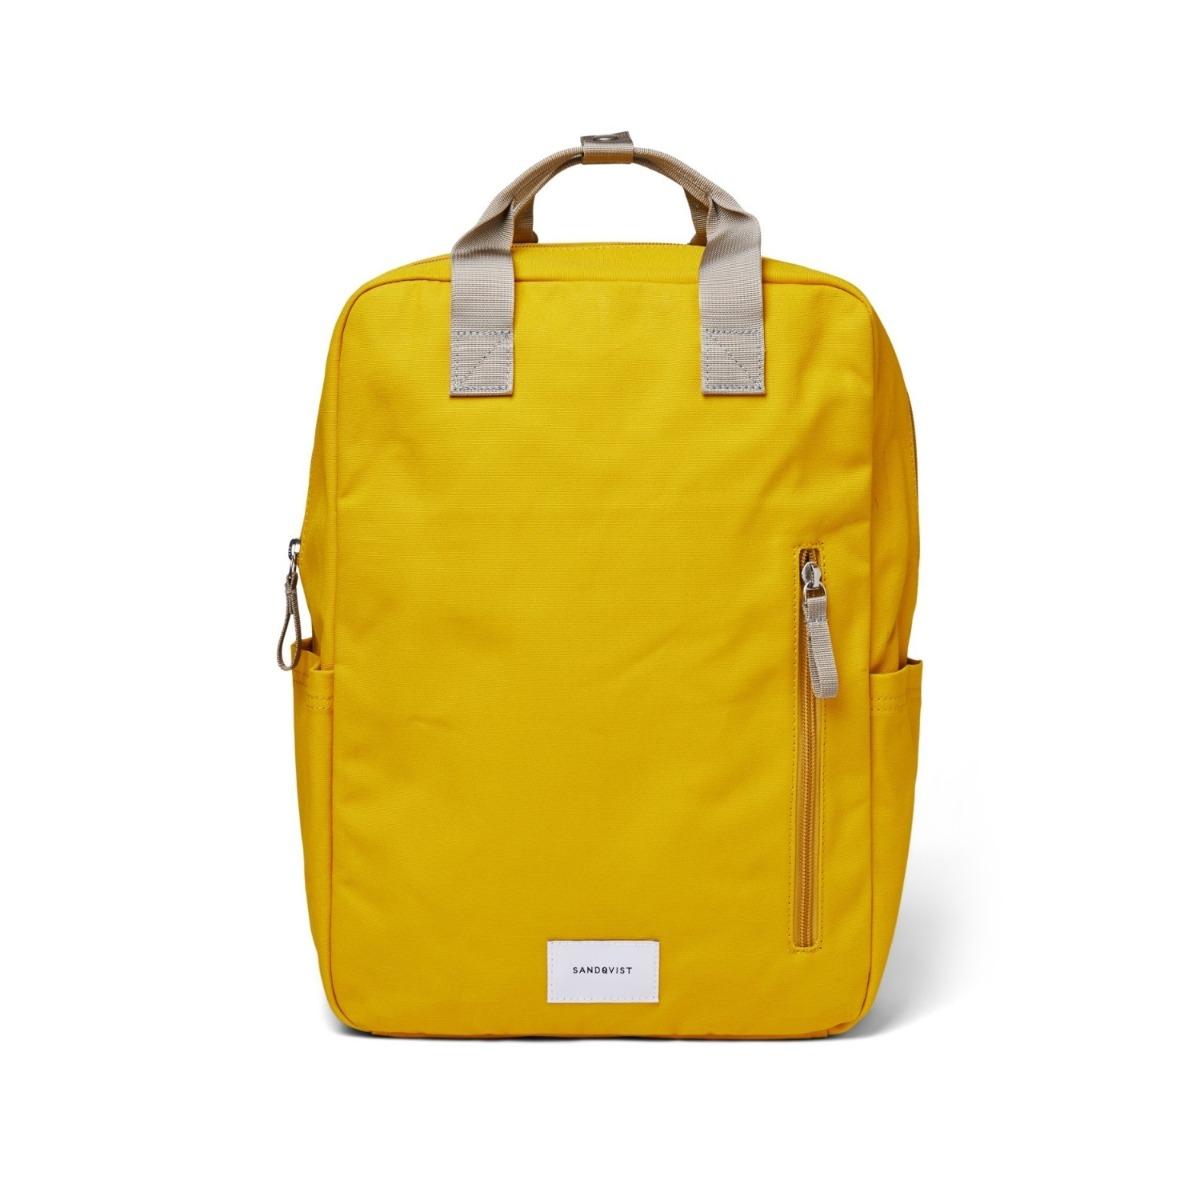 Sandqvist Backpack Knut Yellow/Grey